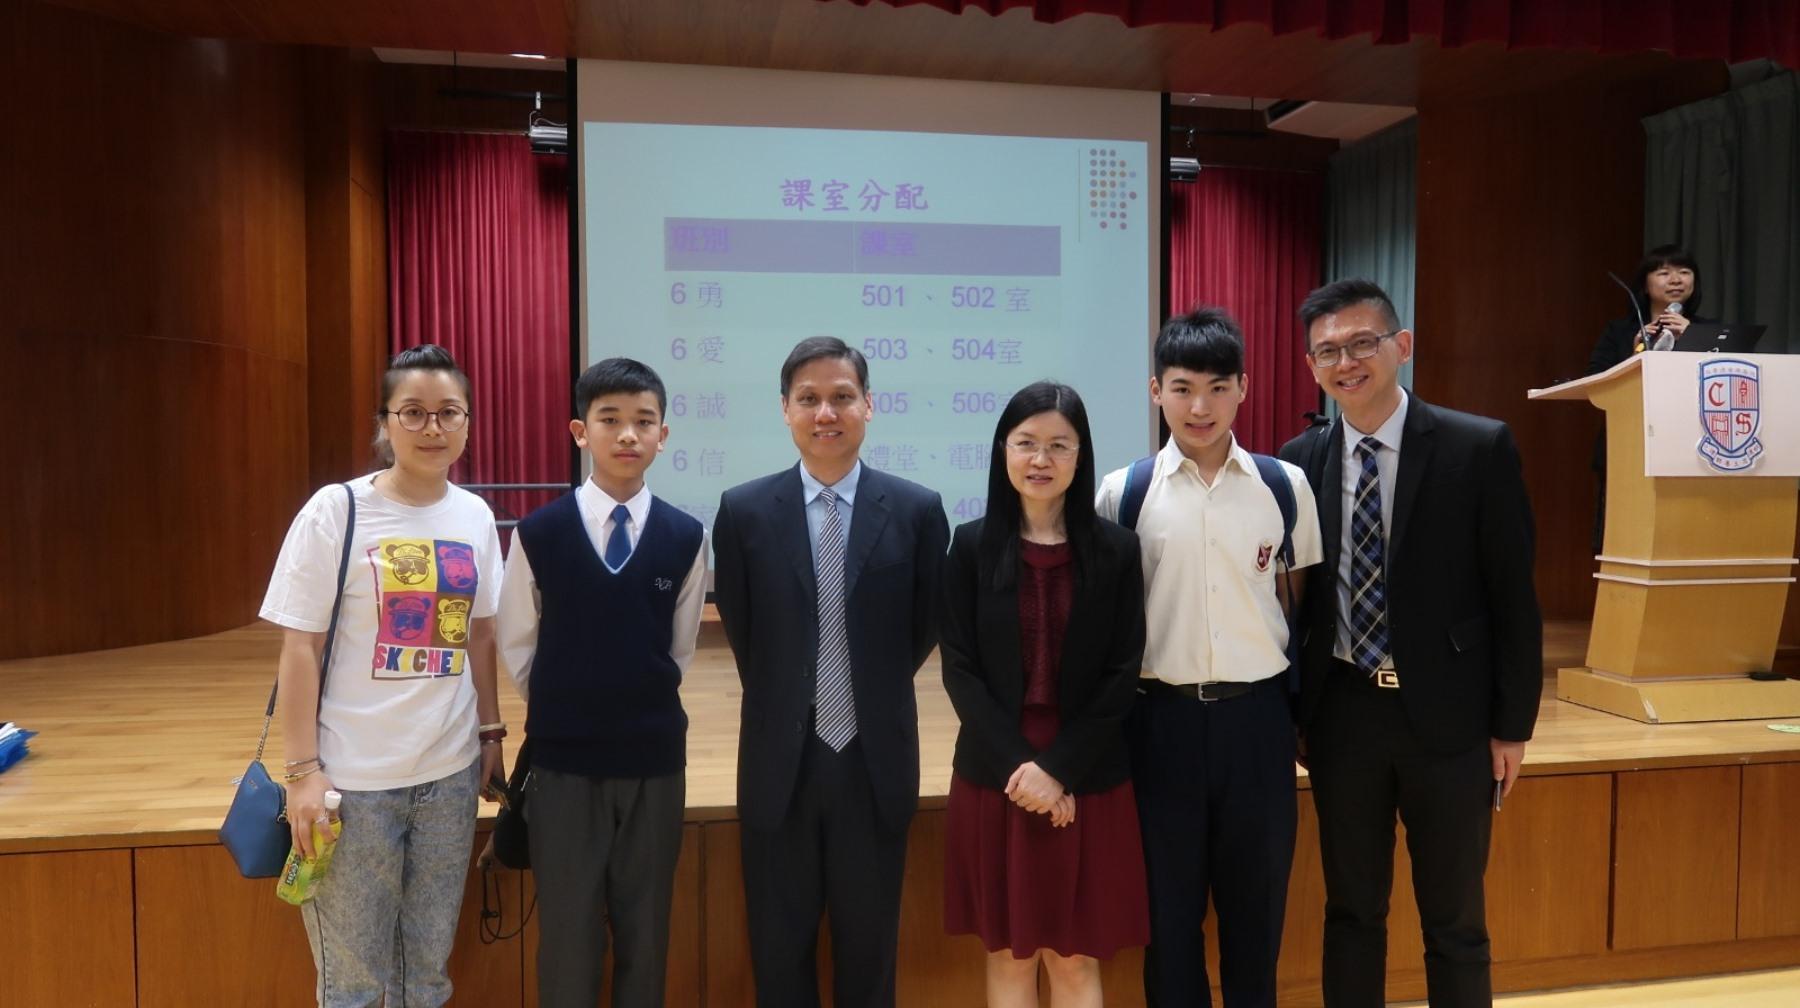 http://npc.edu.hk/sites/default/files/2_1331.jpg